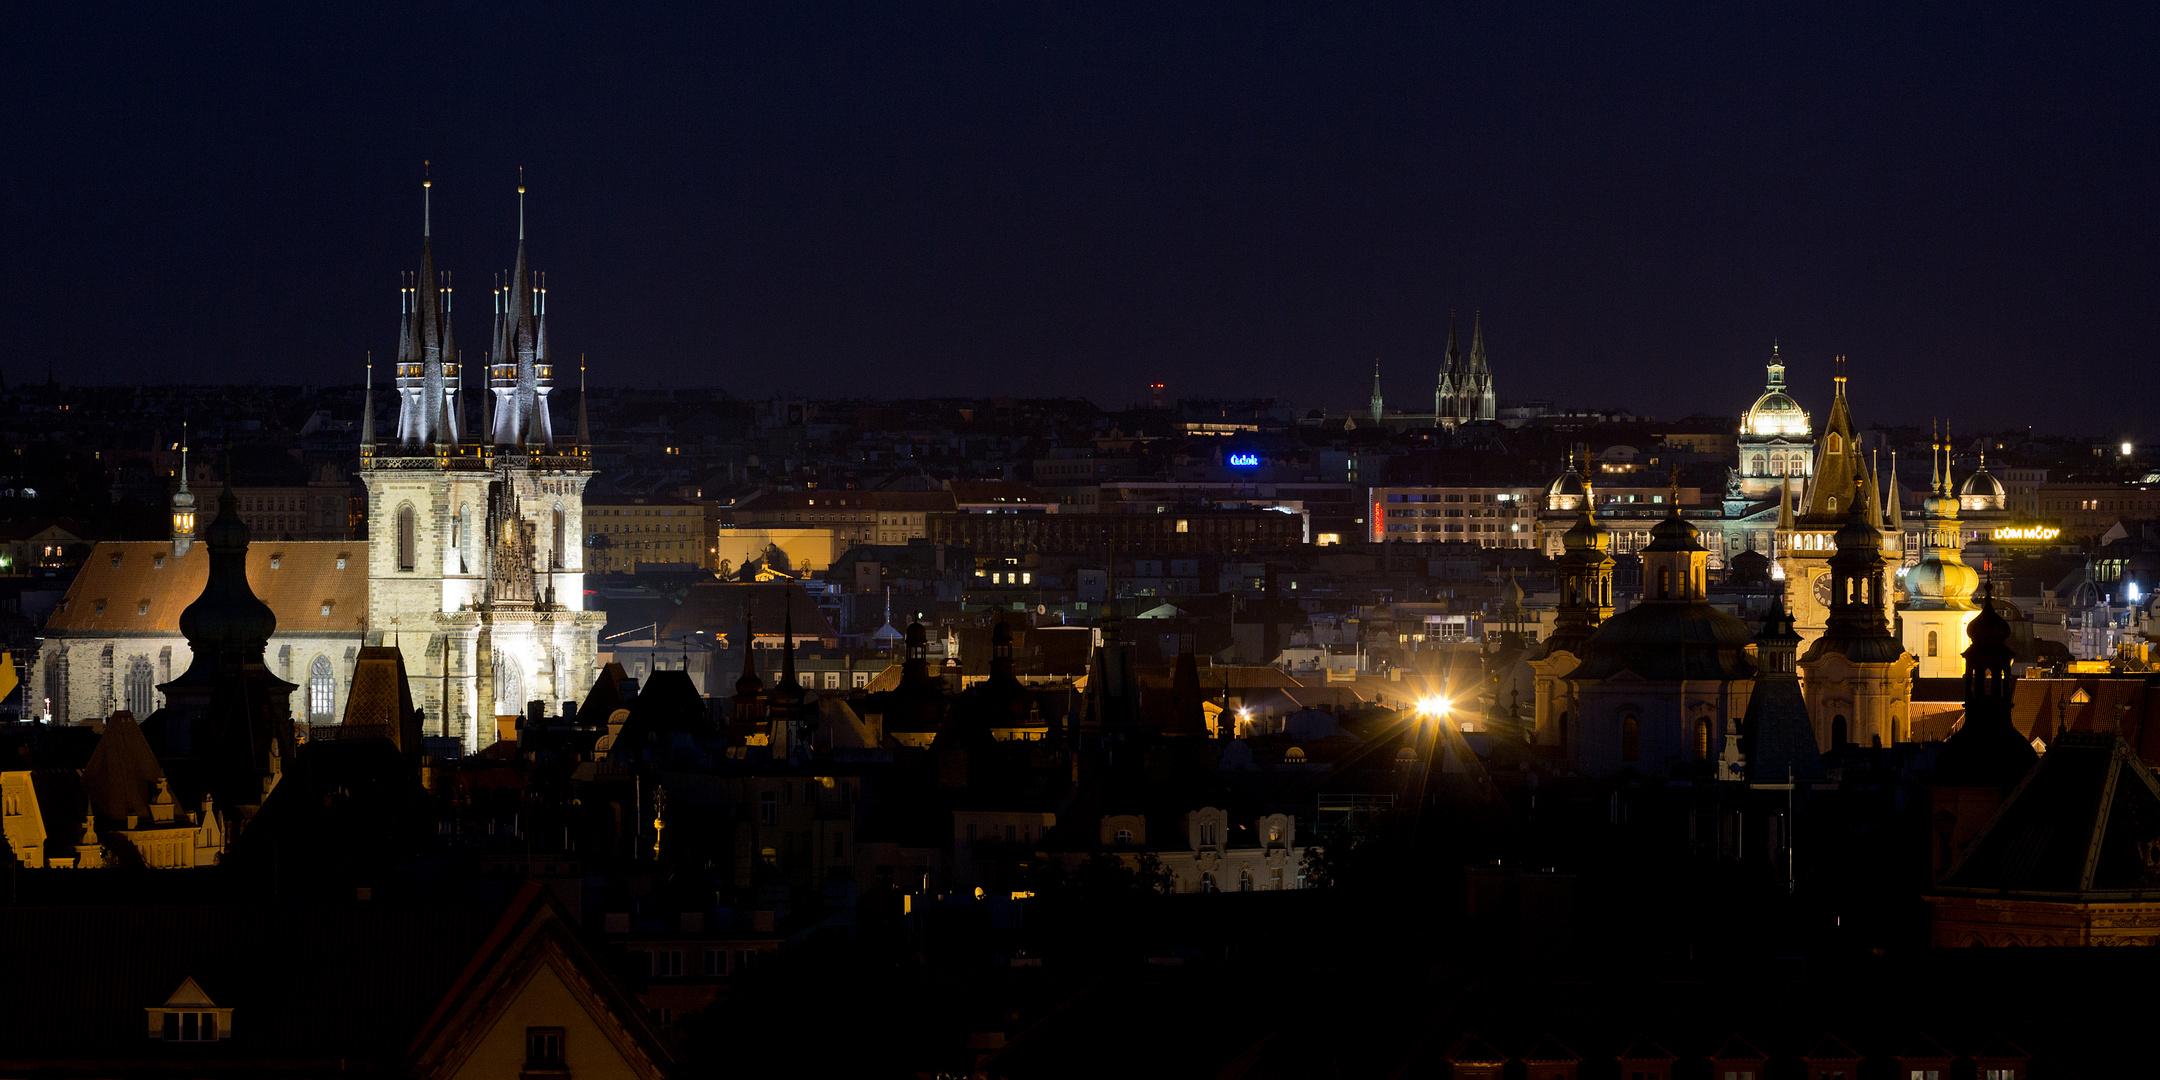 Teyn-Kirche und Umgebung bei Nacht